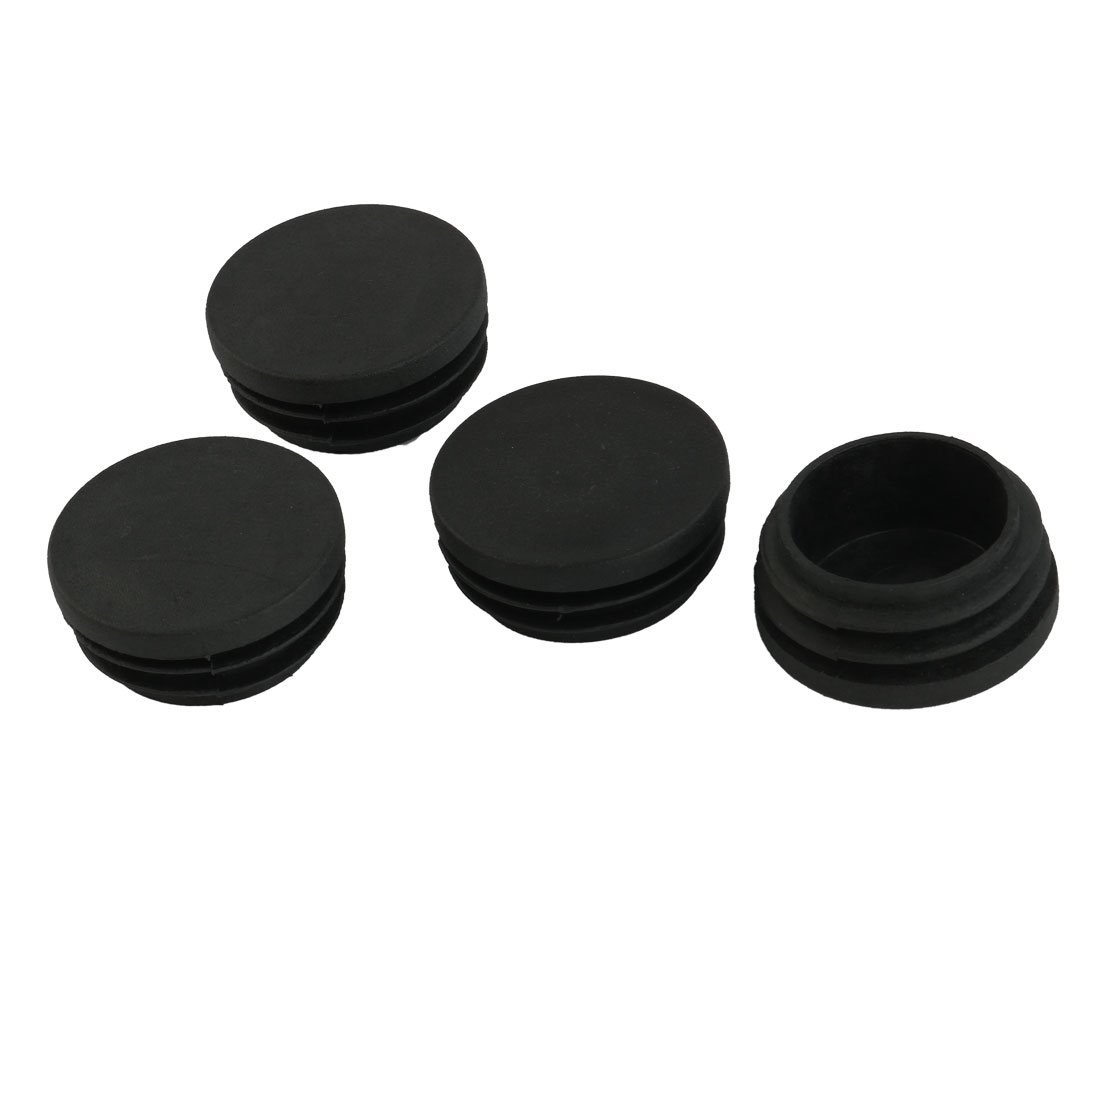 4 Pcs Furniture 38mm Diameter Screw Type Round Tube Insert Cover Black